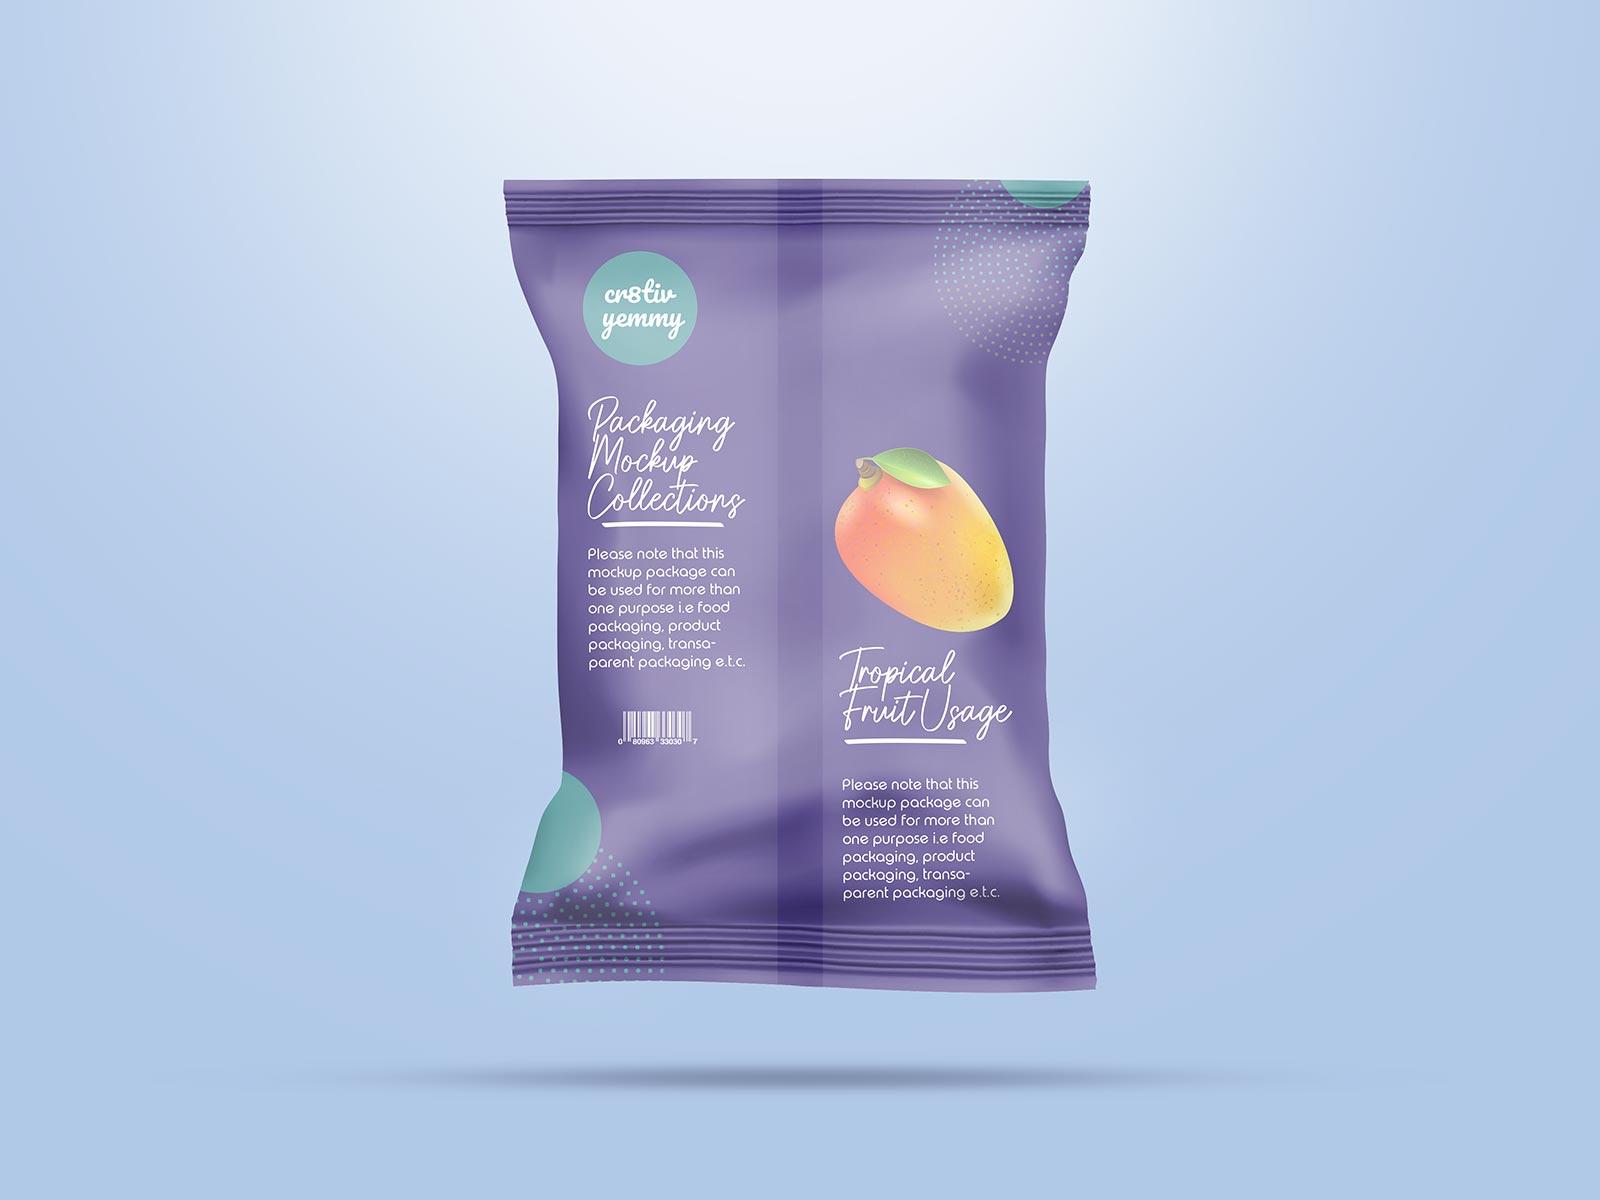 Free Snack Pack Packaging Mockup PSD (1)